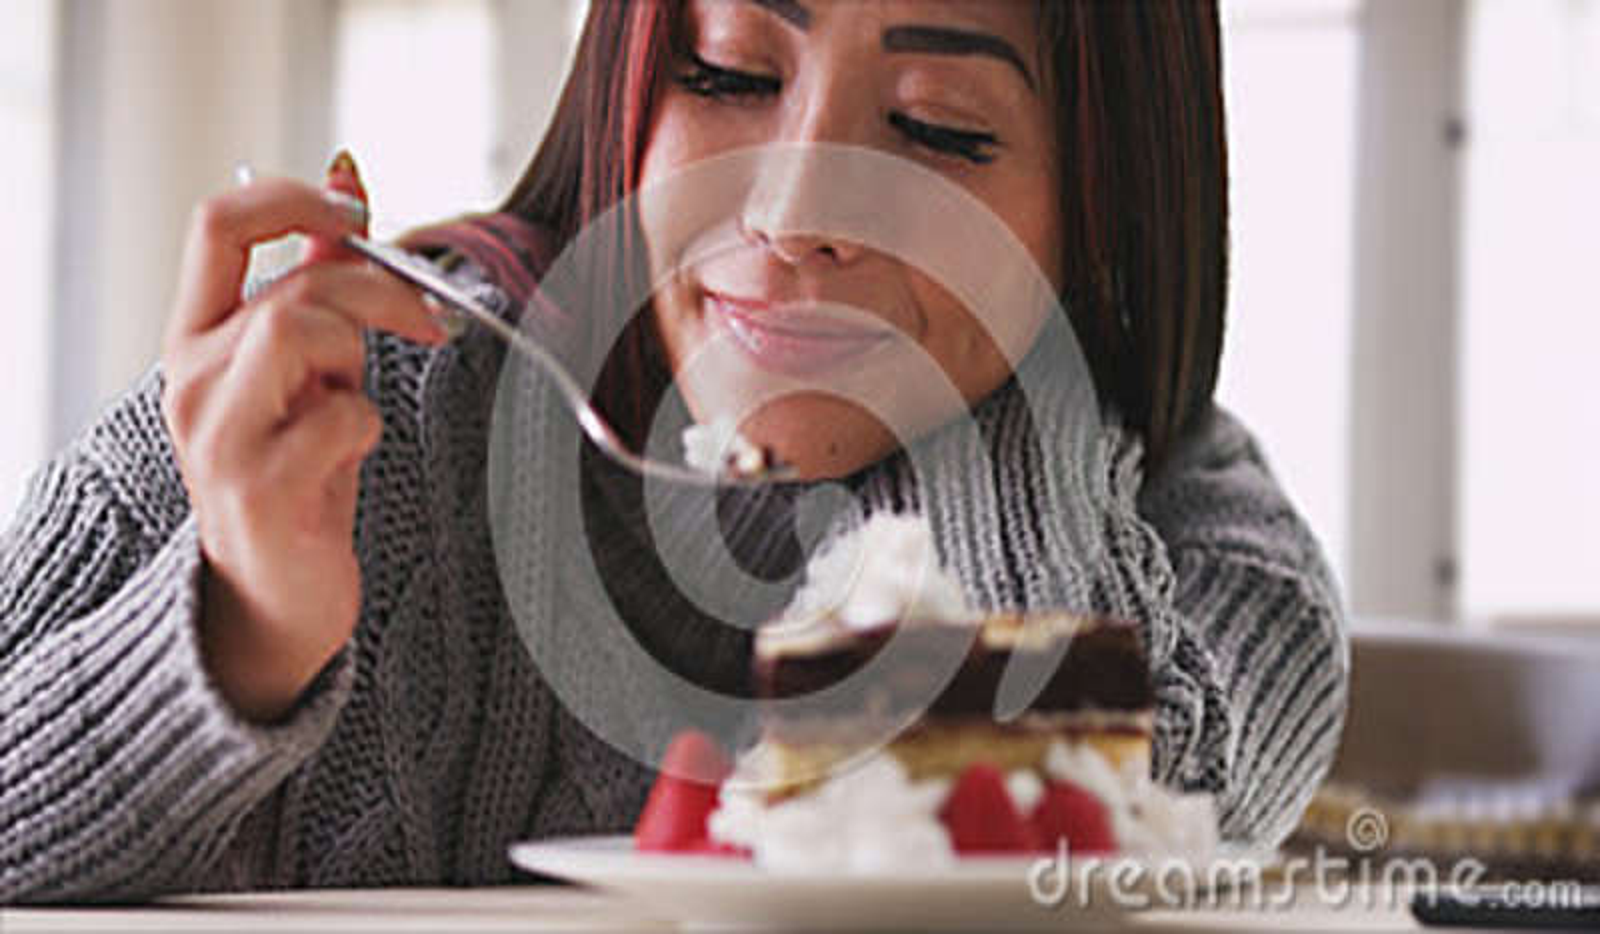 Japanese woman eating cake at home